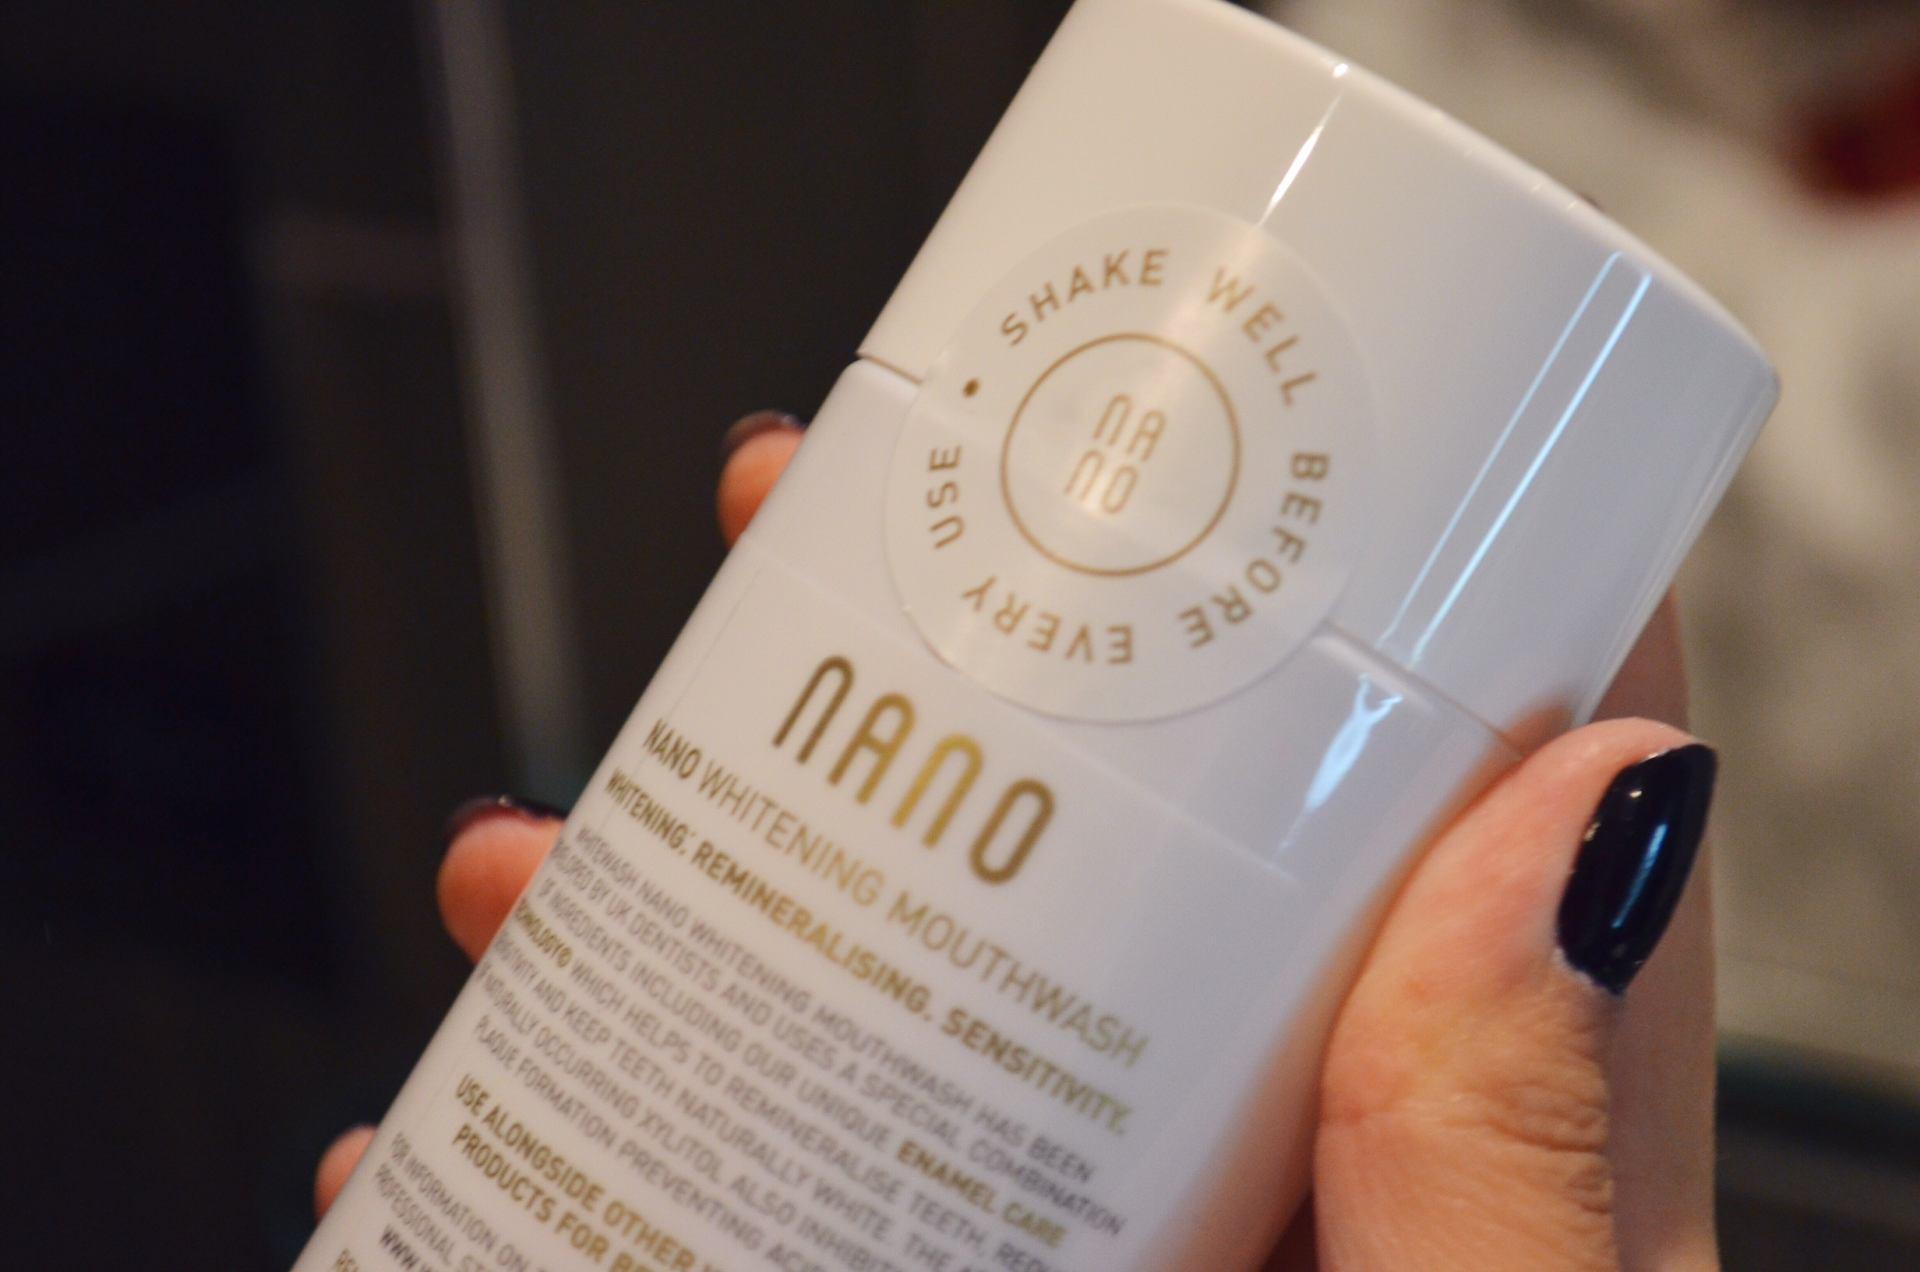 nano-whitening-mouthwash-review